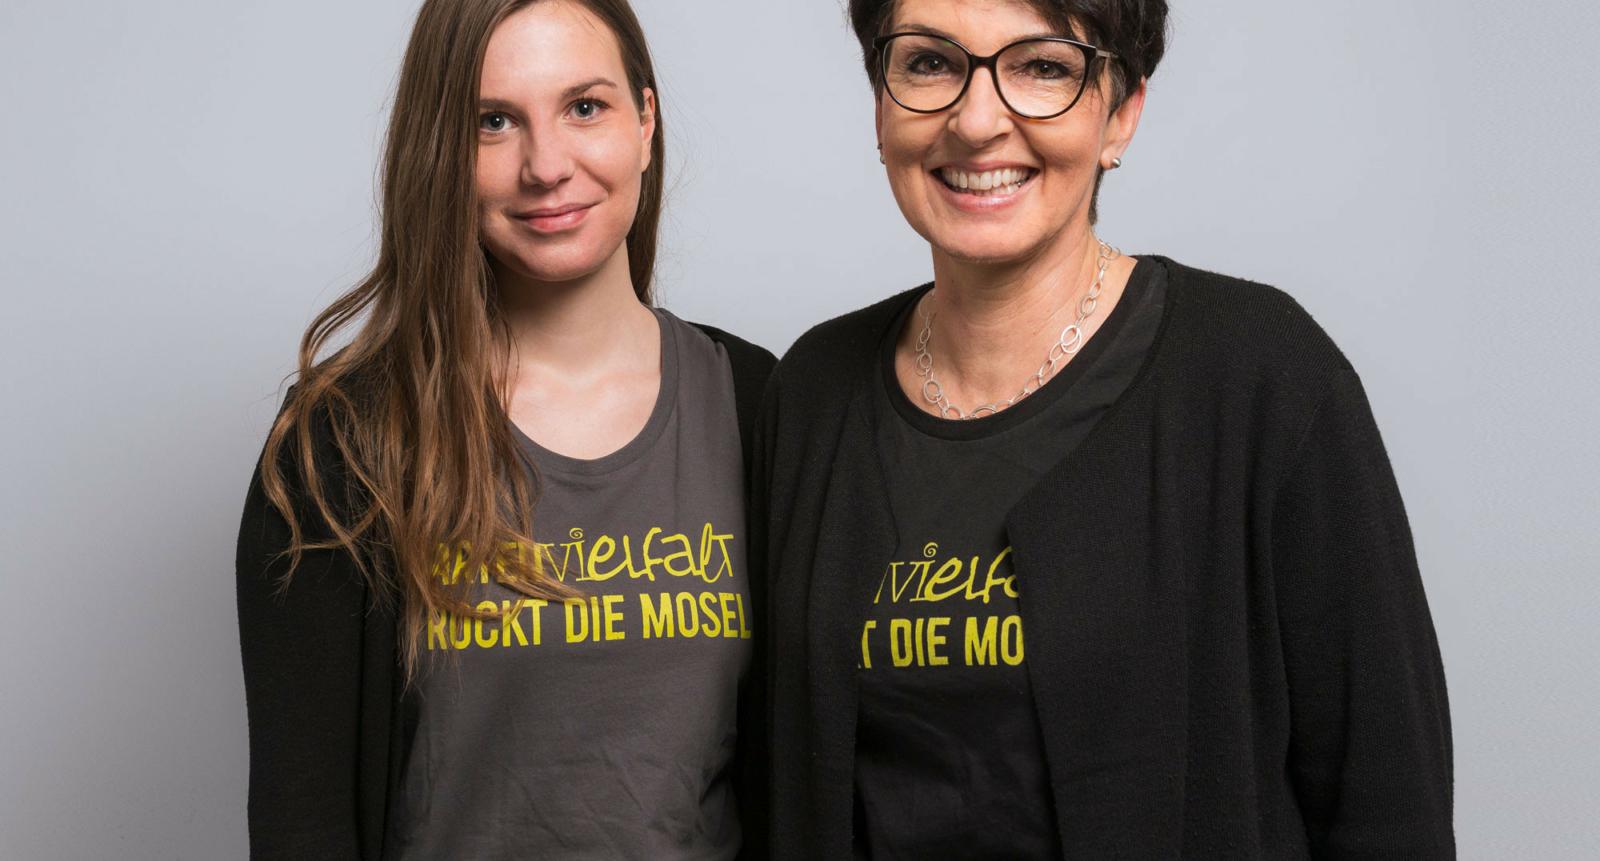 Faszination Mosel - T-Shirt Artenvielfalt